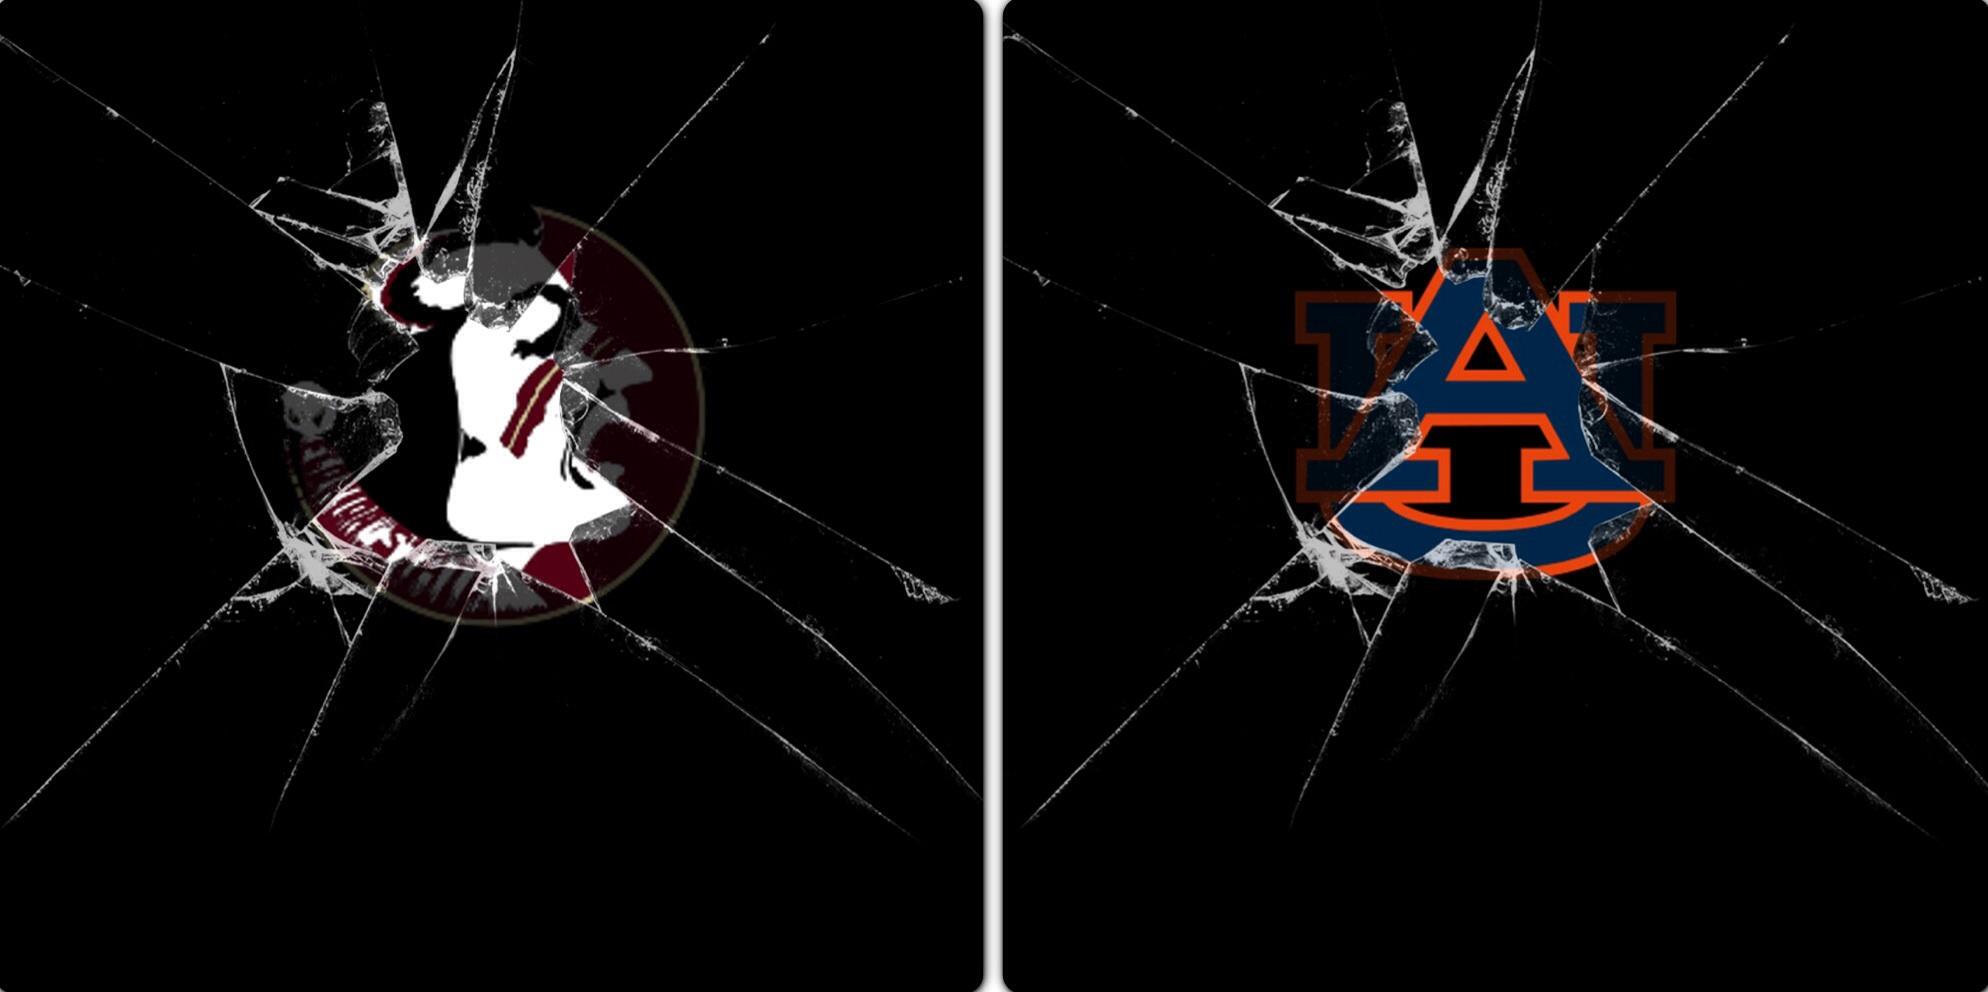 Auburn Football Wallpaper for Computer - WallpaperSafari